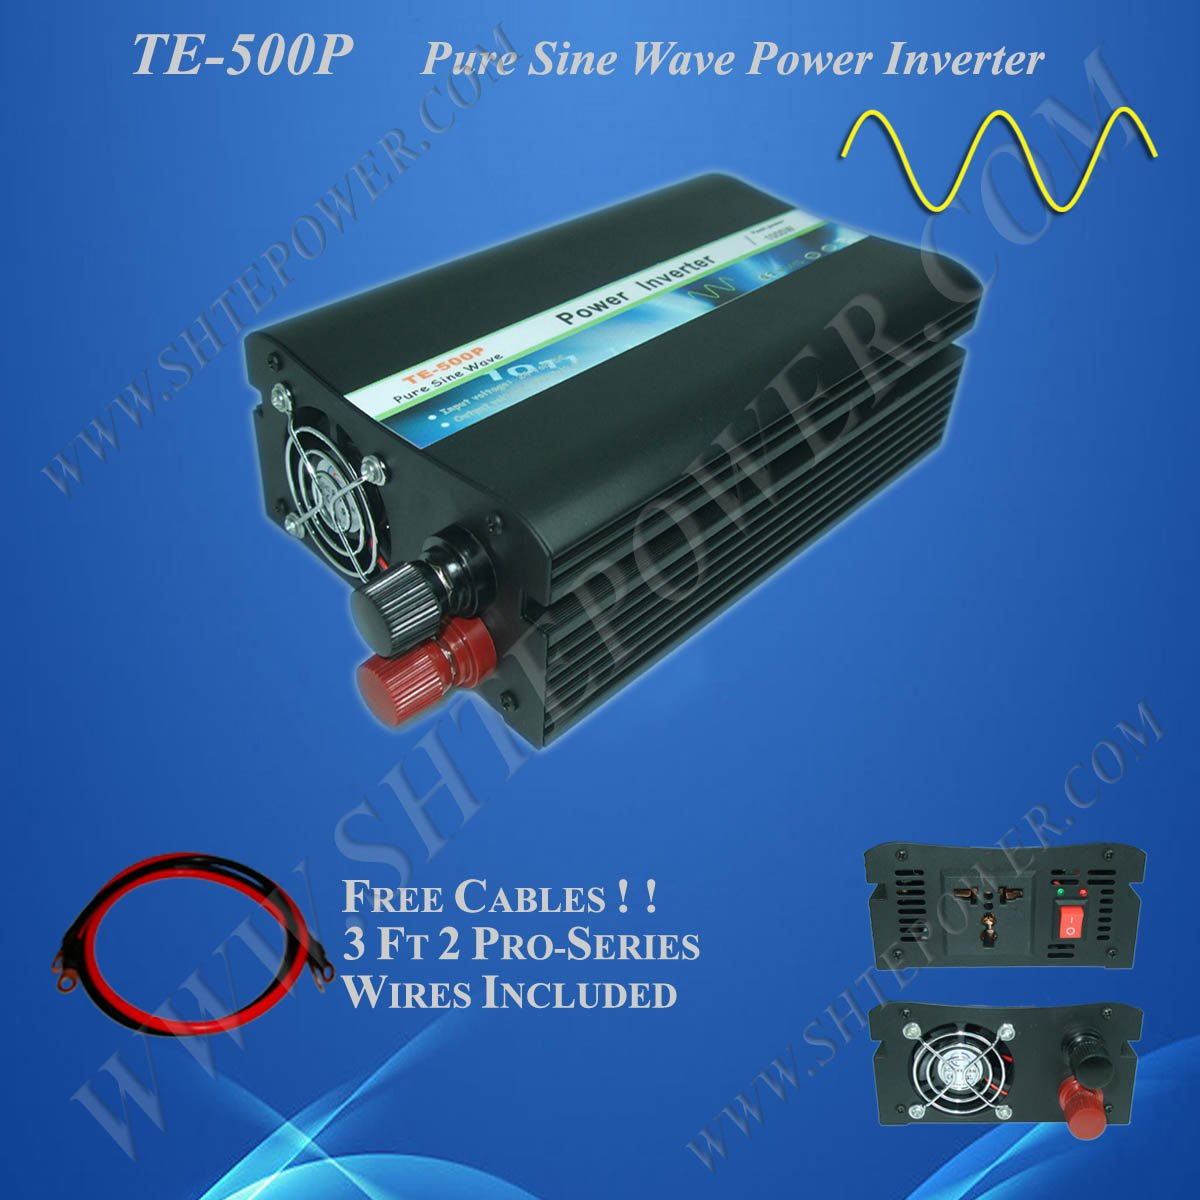 48VDC to 240VAC 500watts Pure Sine Wave Power Inverter 1500w 48vdc to 100v 240vac pure sine wave power inverter